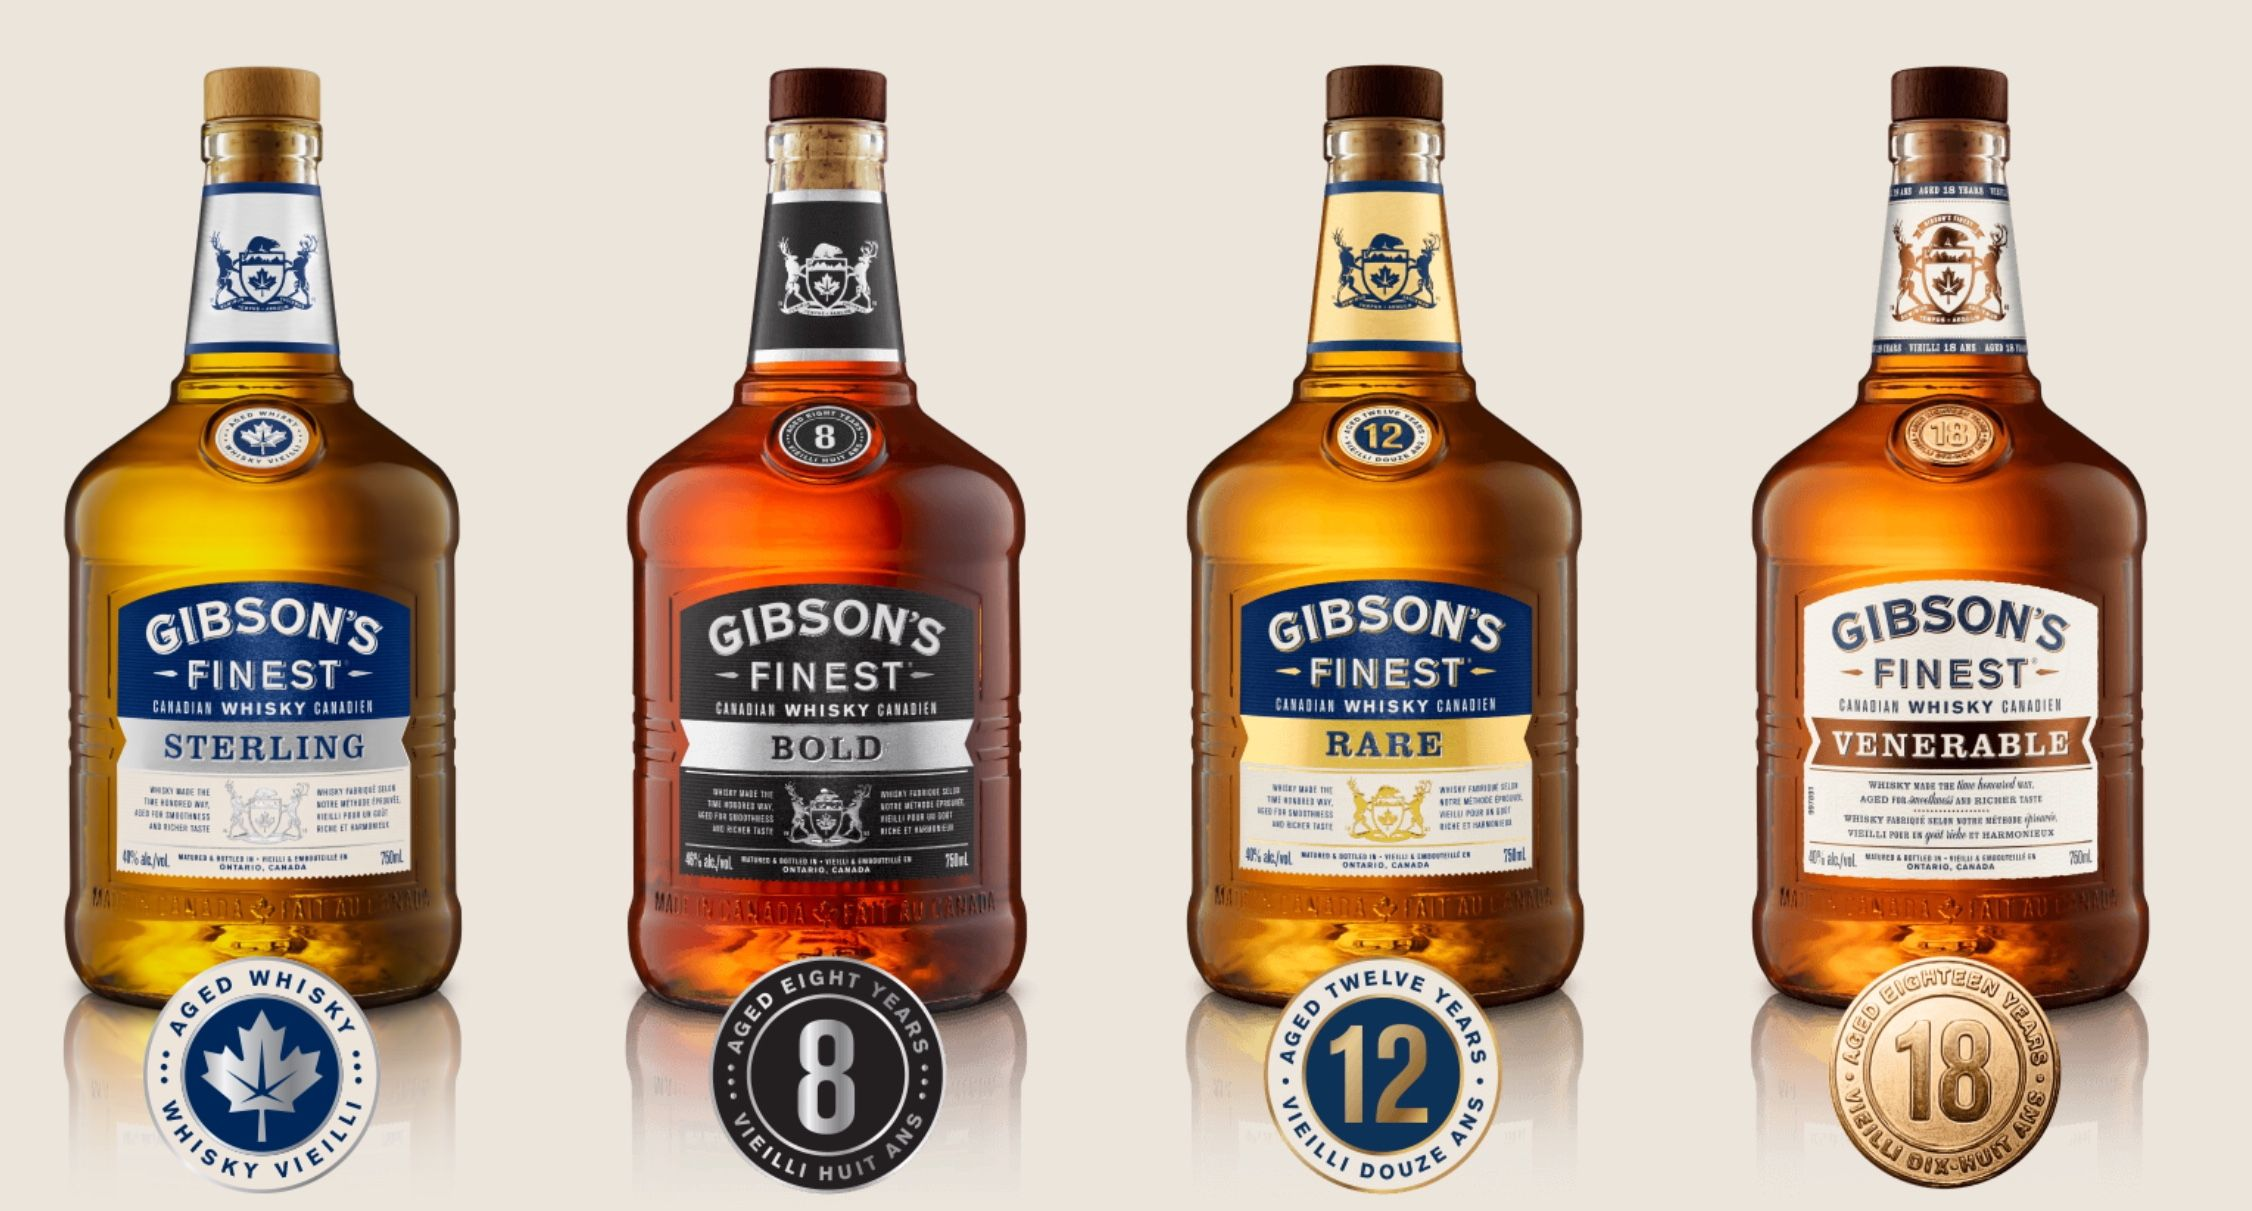 Pin By Doylerburger On Gibson S Finest Corona Beer Bottle Beer Bottle Whiskey Bottle